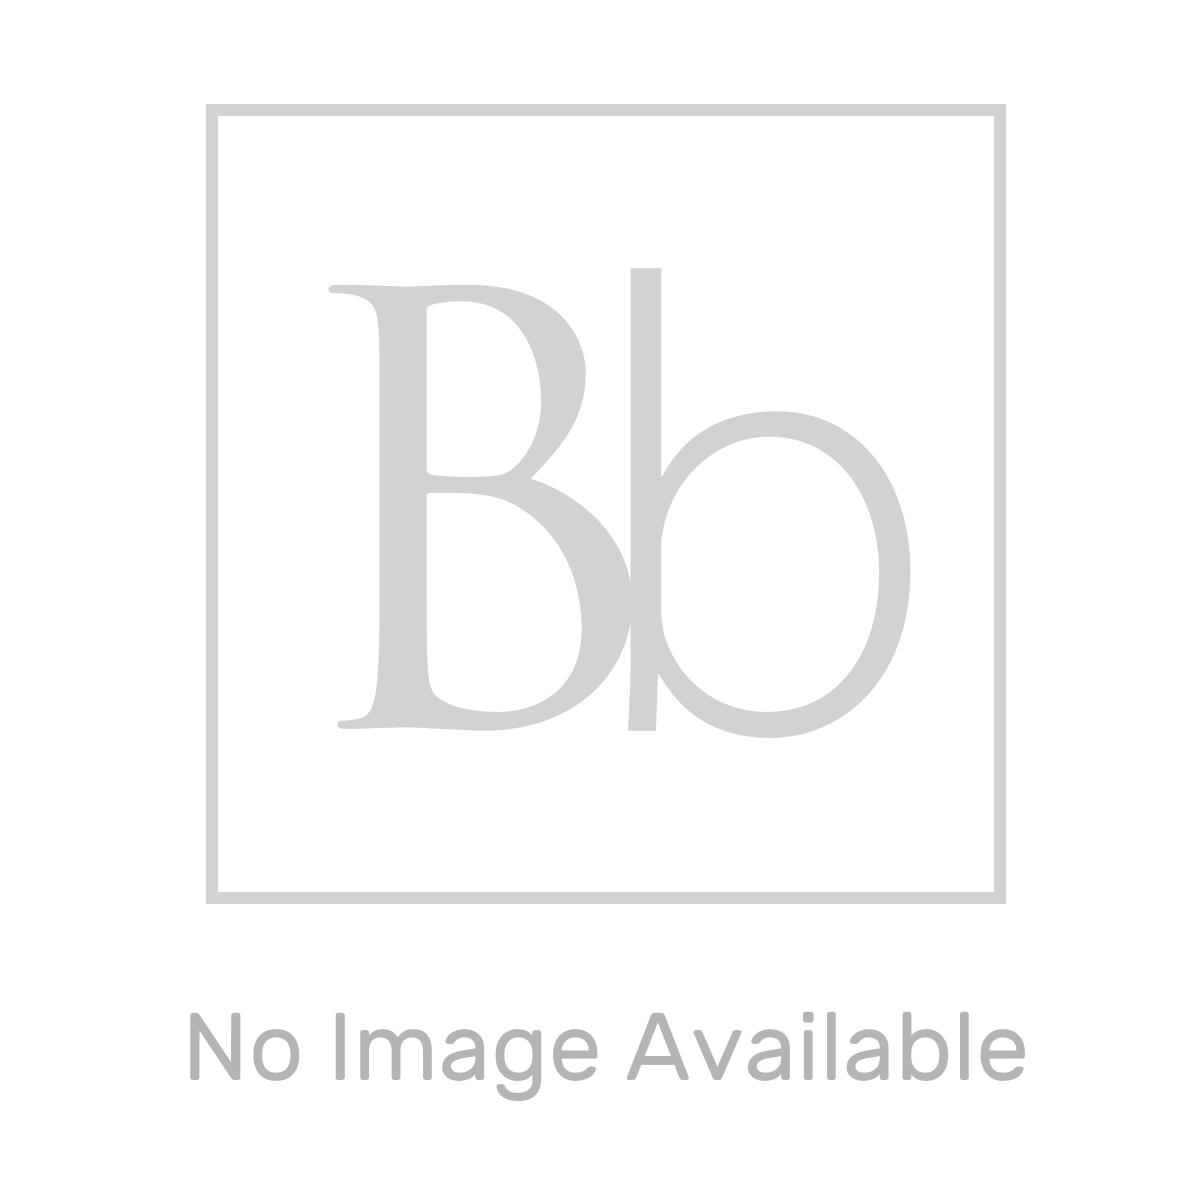 RAK Feeling Chrome Wall Profile 2000mm